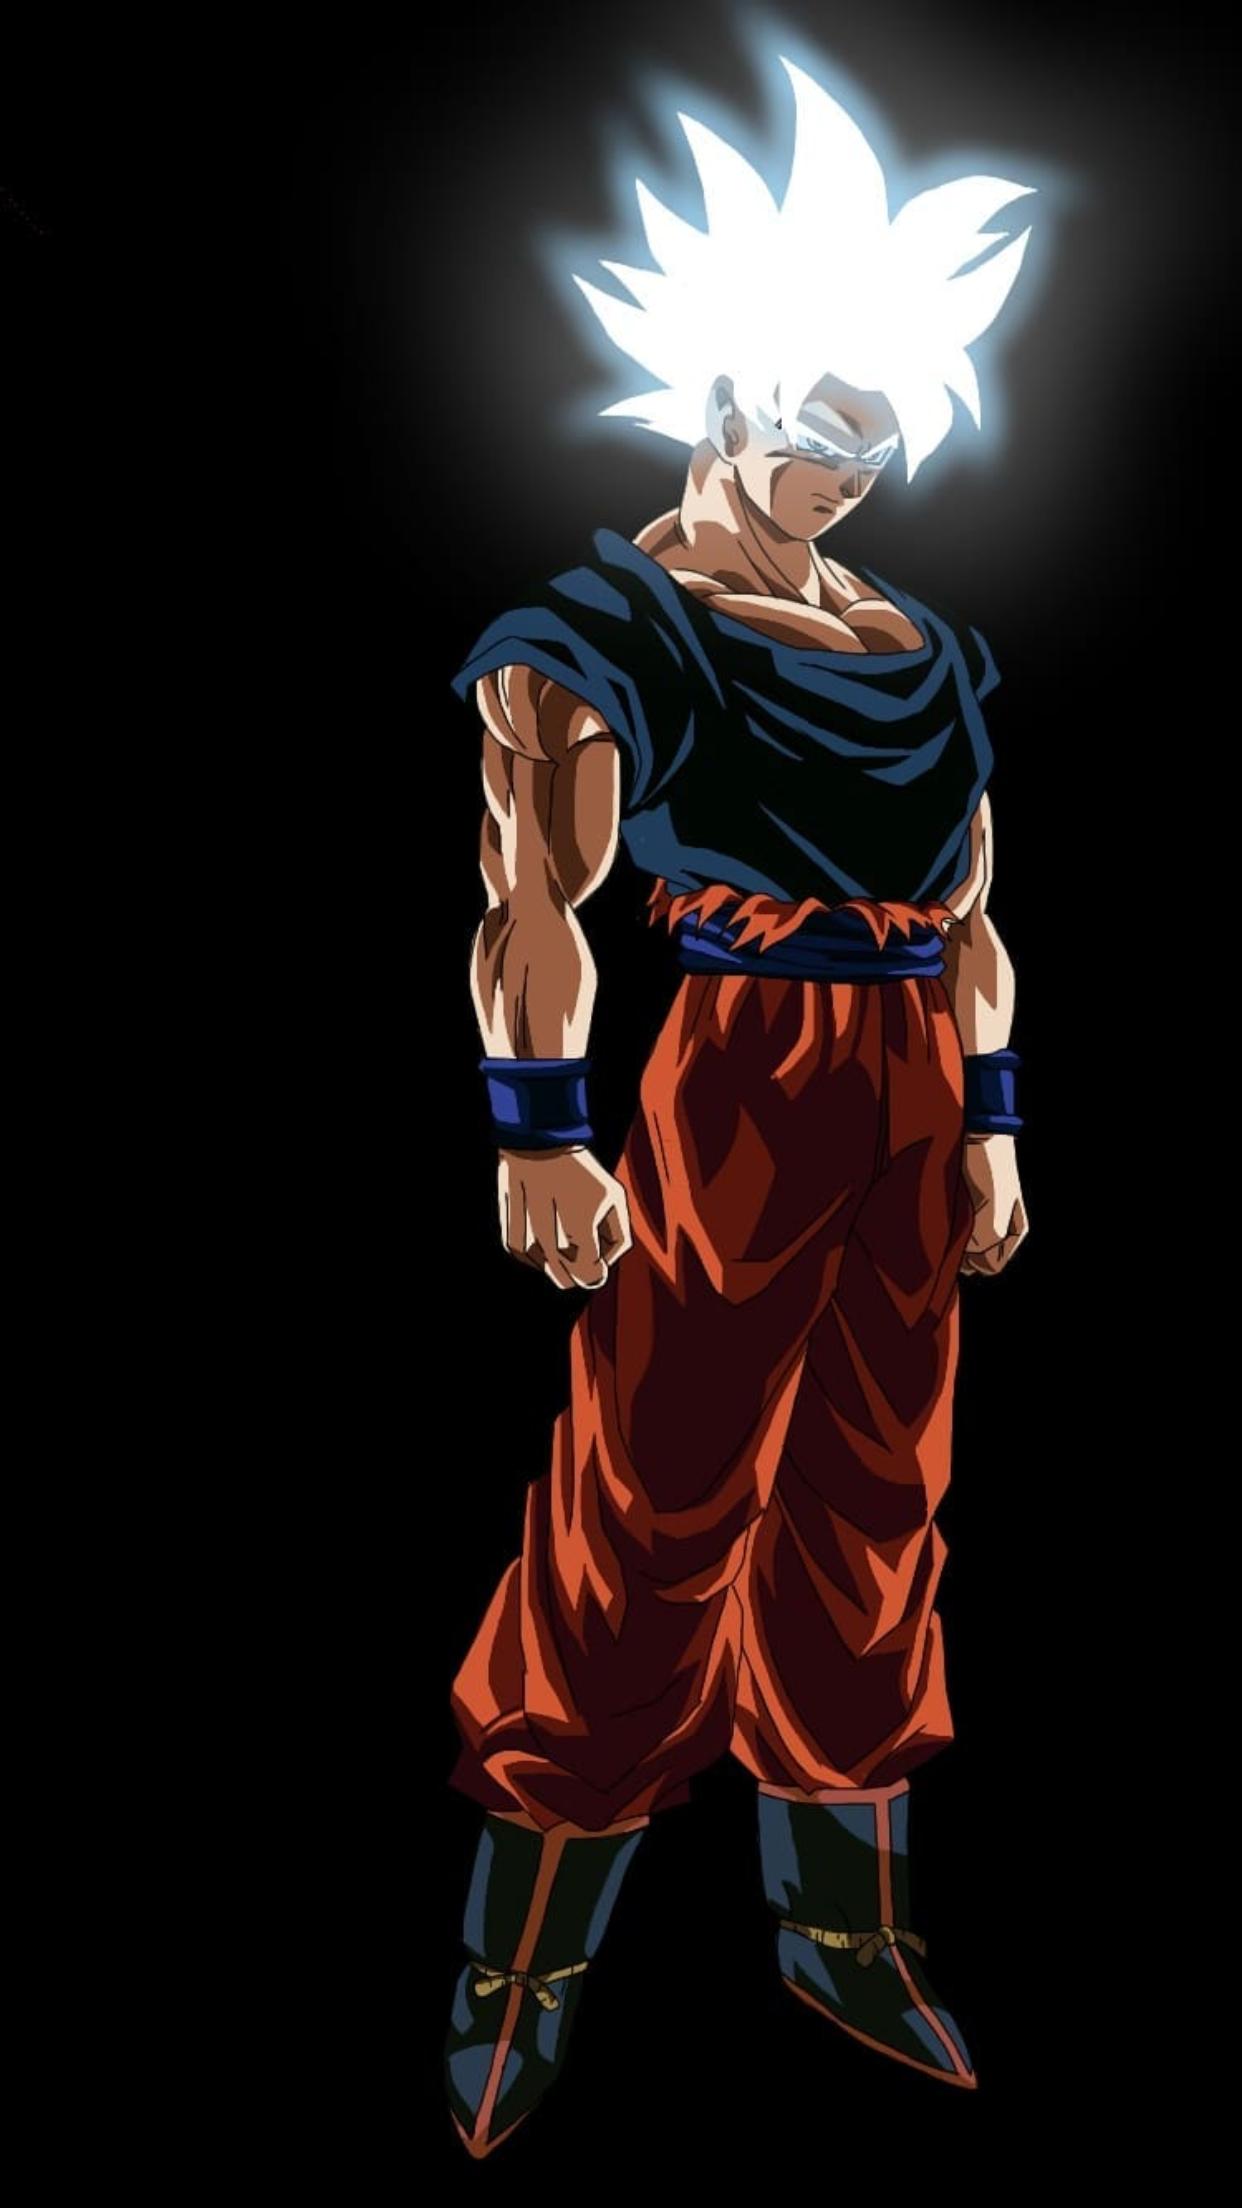 Follow Me Trending Searches Trend Goku Wallpaper Dragon Ball Anime Dragon Ball Super